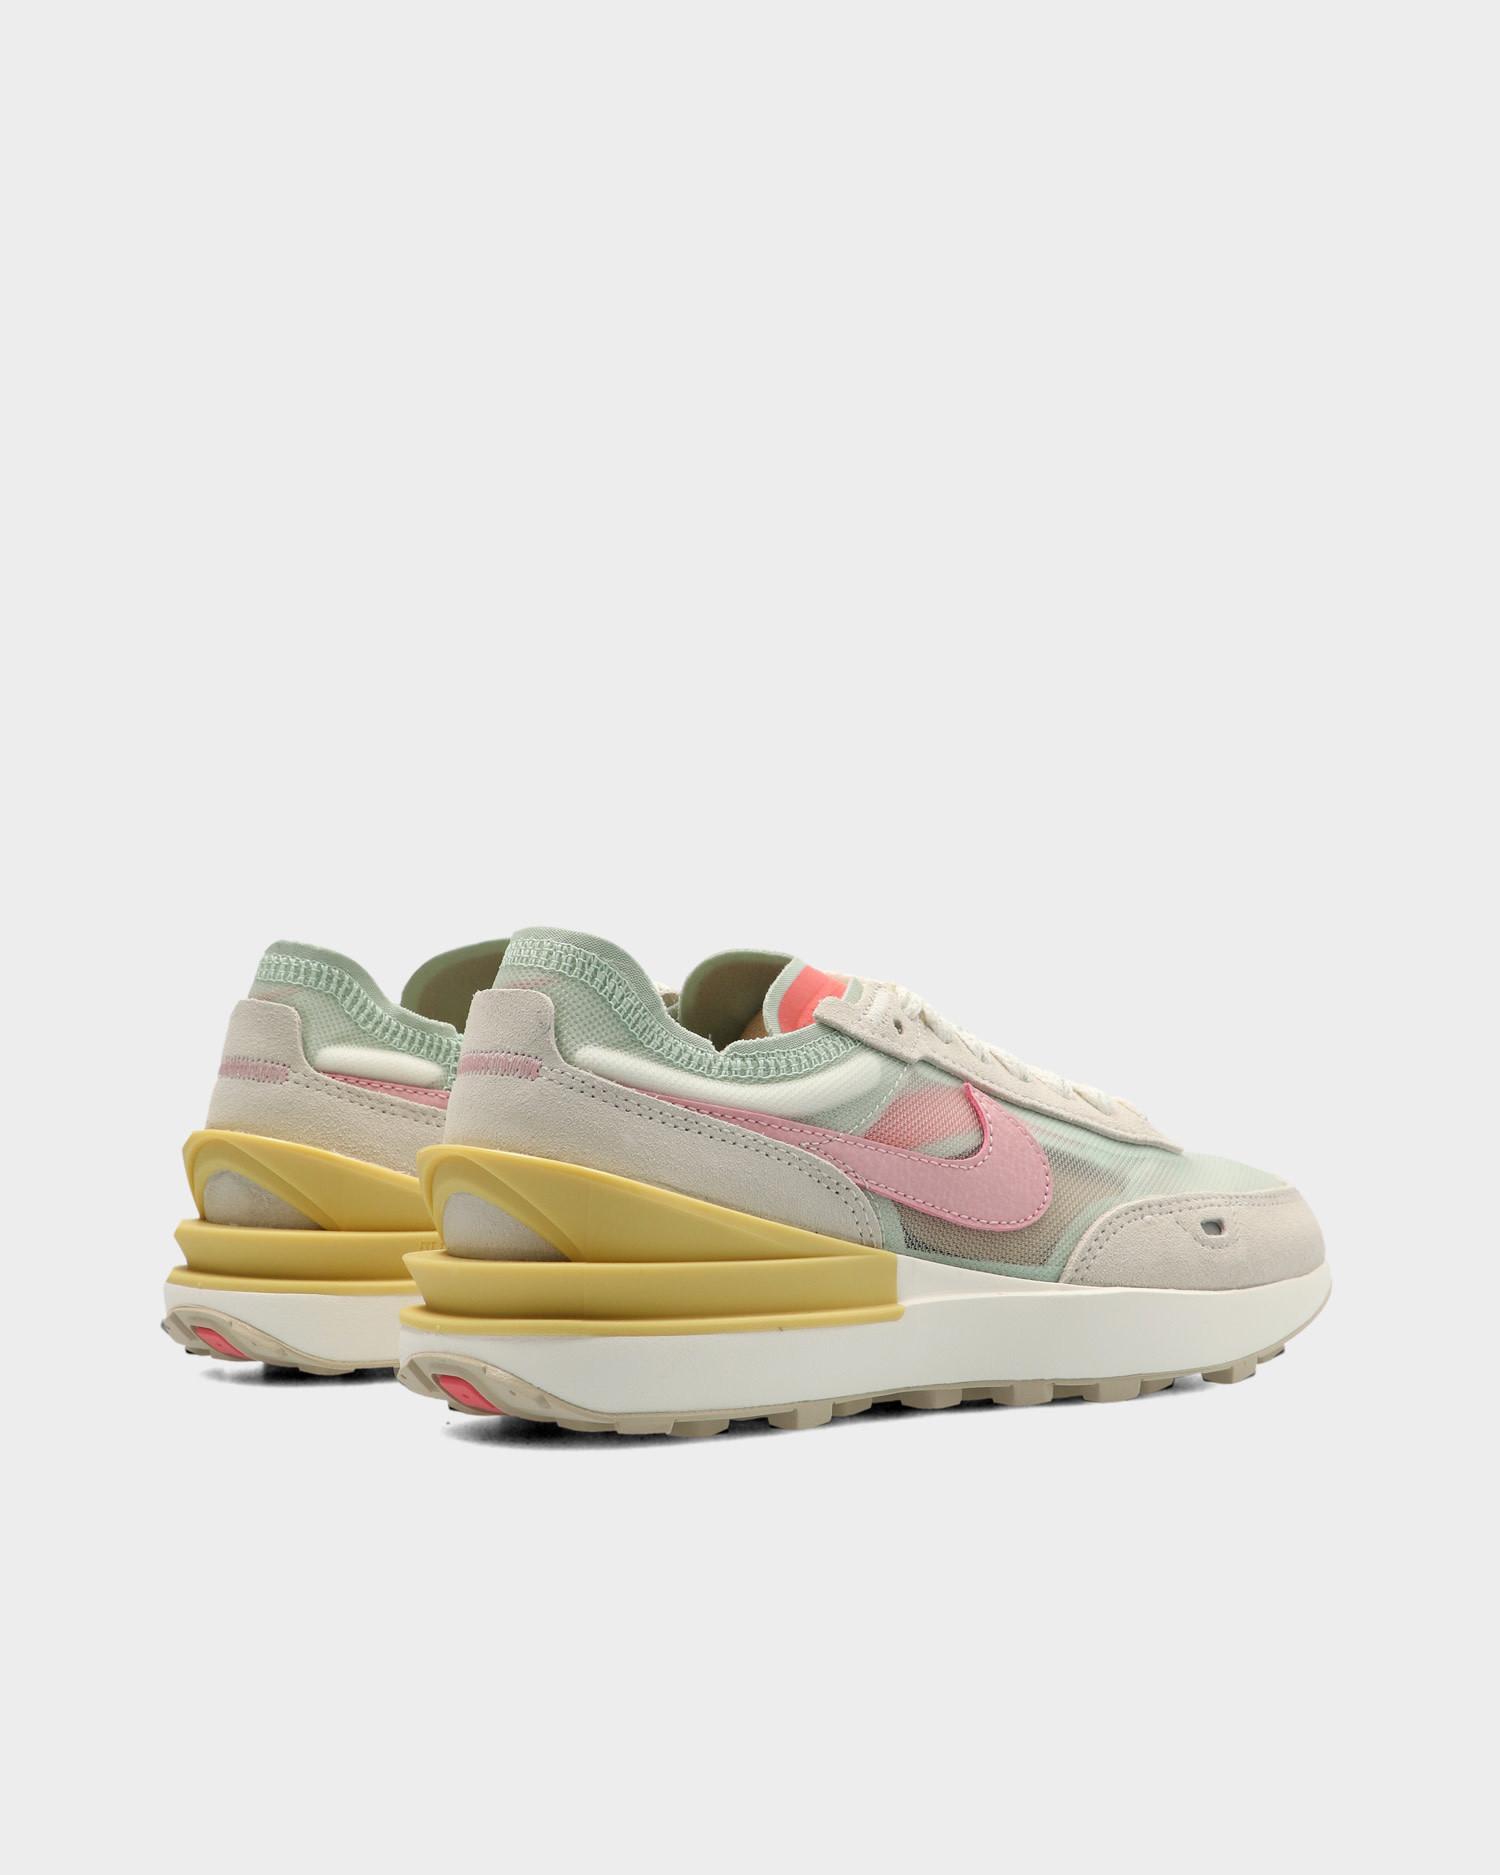 Nike Waffle One Sea Foam/Pink Glaze- Sea Glass- Saturn Gold